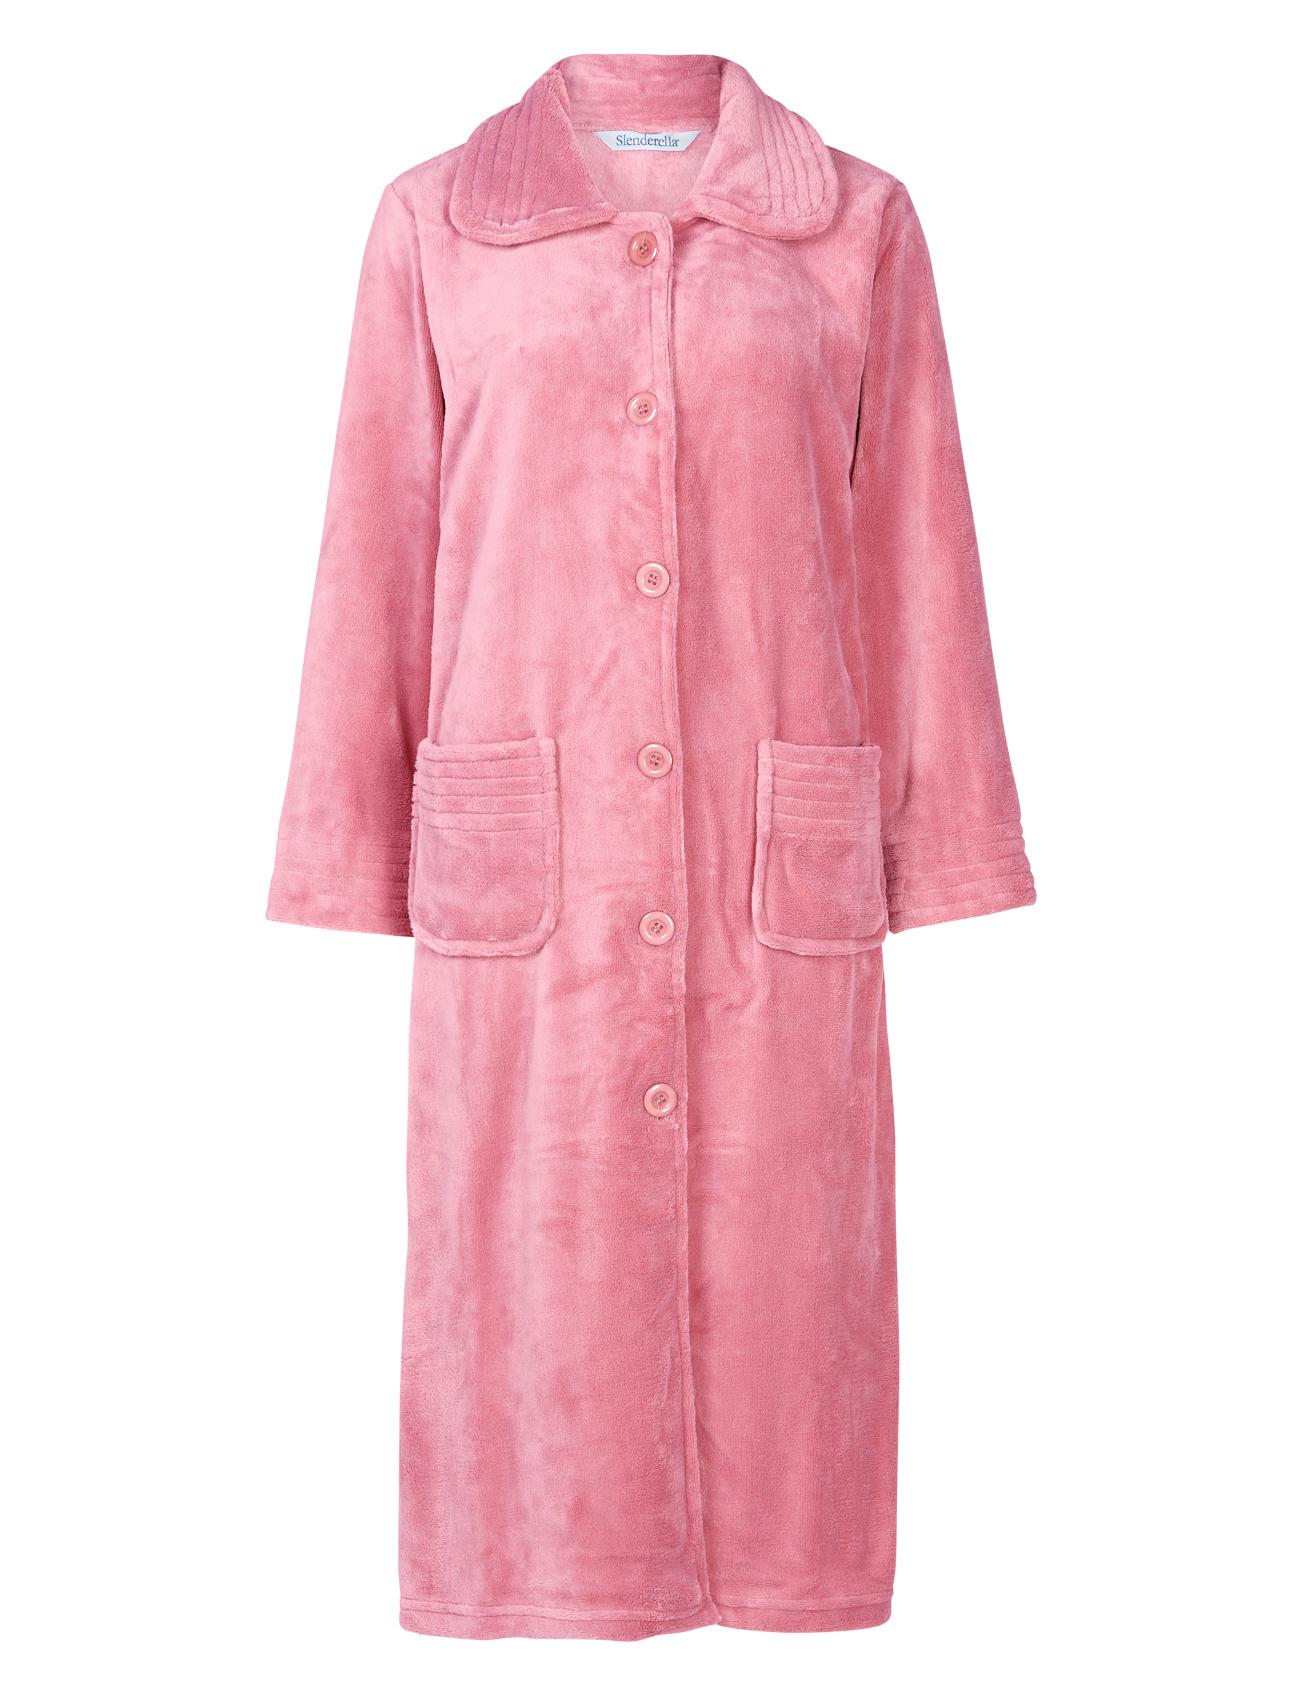 Dressing Gown Womens Button Up Soft Fleecy Plain Bath Robe Pockets ...